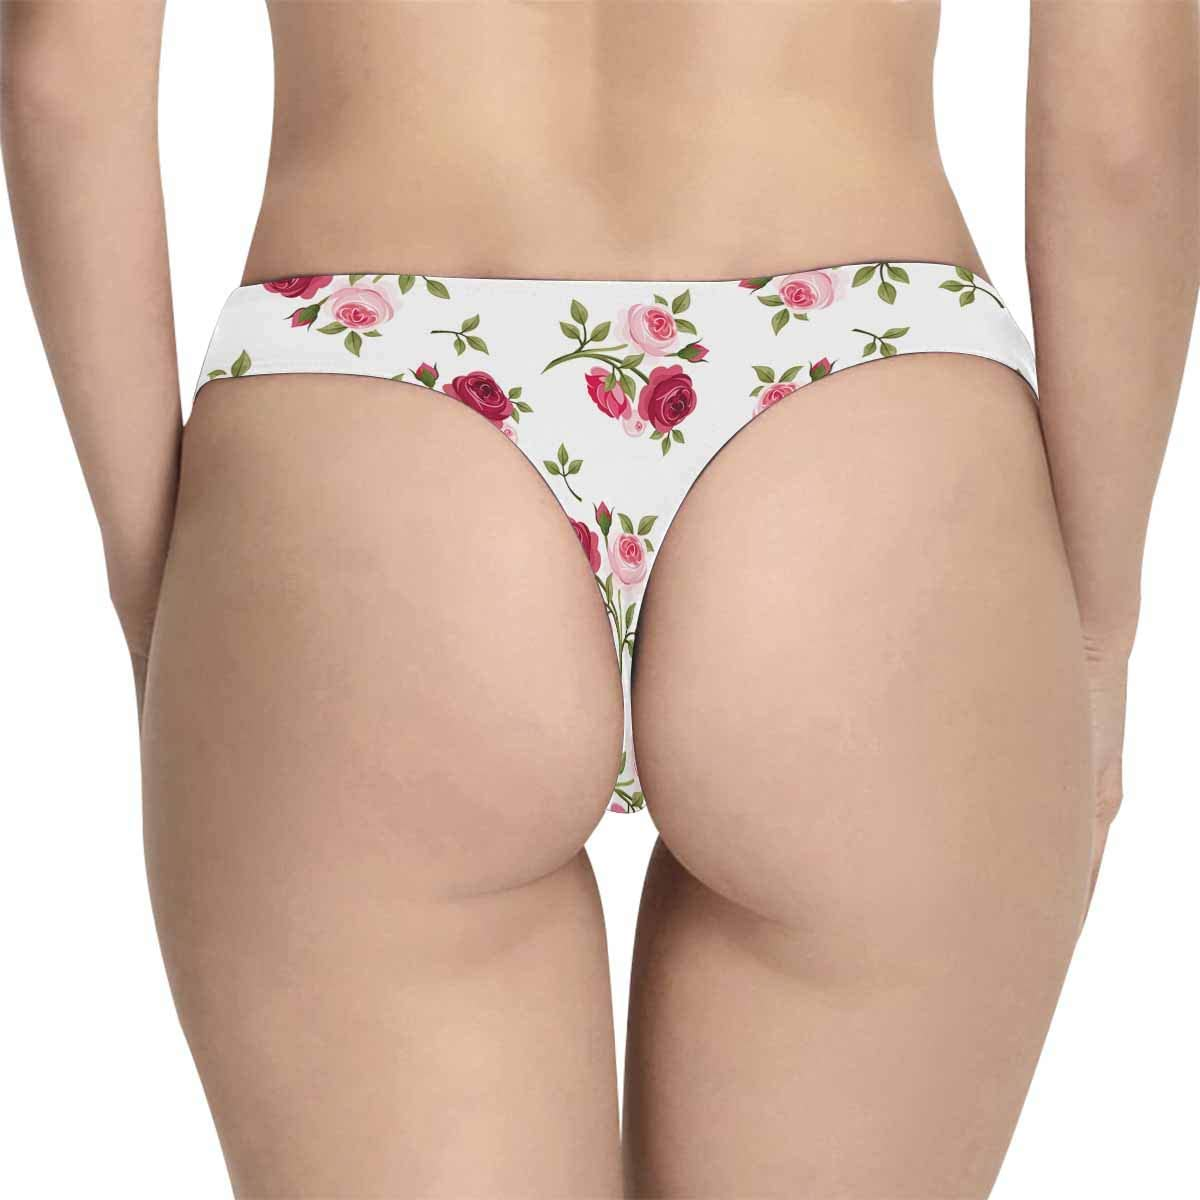 INTERESTPRINT Womens Underwear Panties Soft Thongs Red and Pink Roses